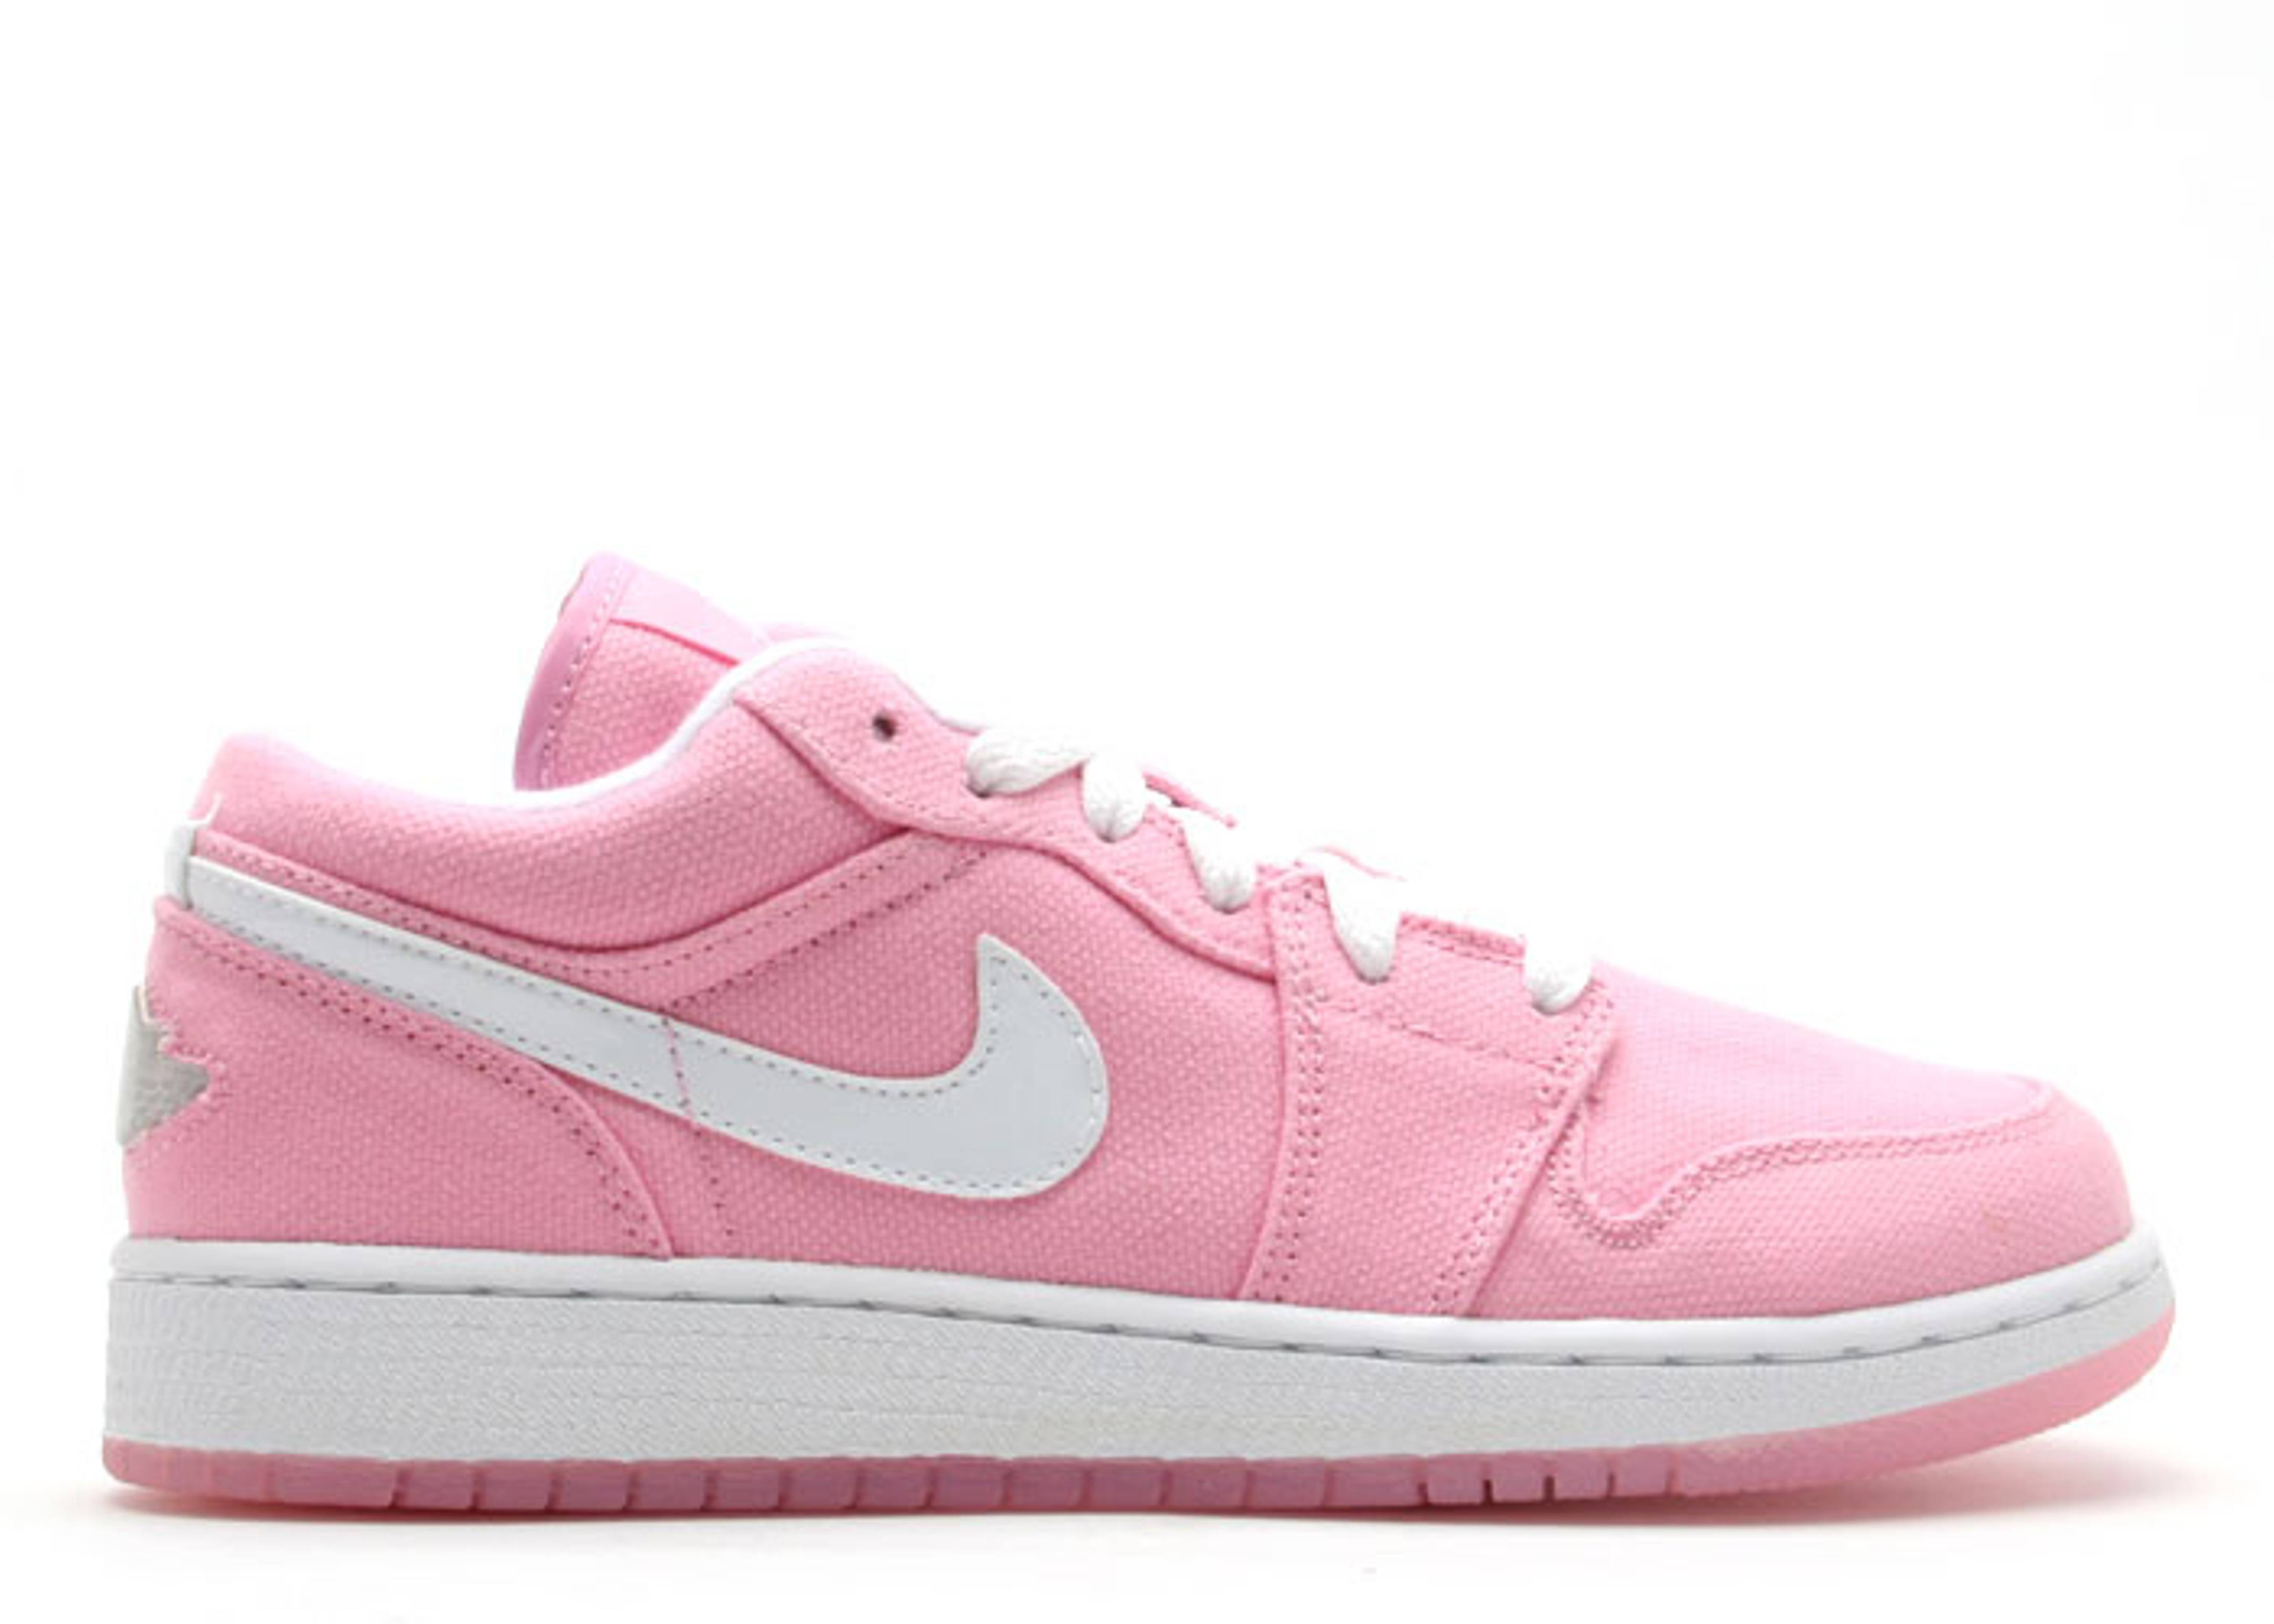 3e6cad8d67e7 Jordan 1 Retro Canvas Low (gs) - Air Jordan - 316098 611 - real pink white- metallic silver